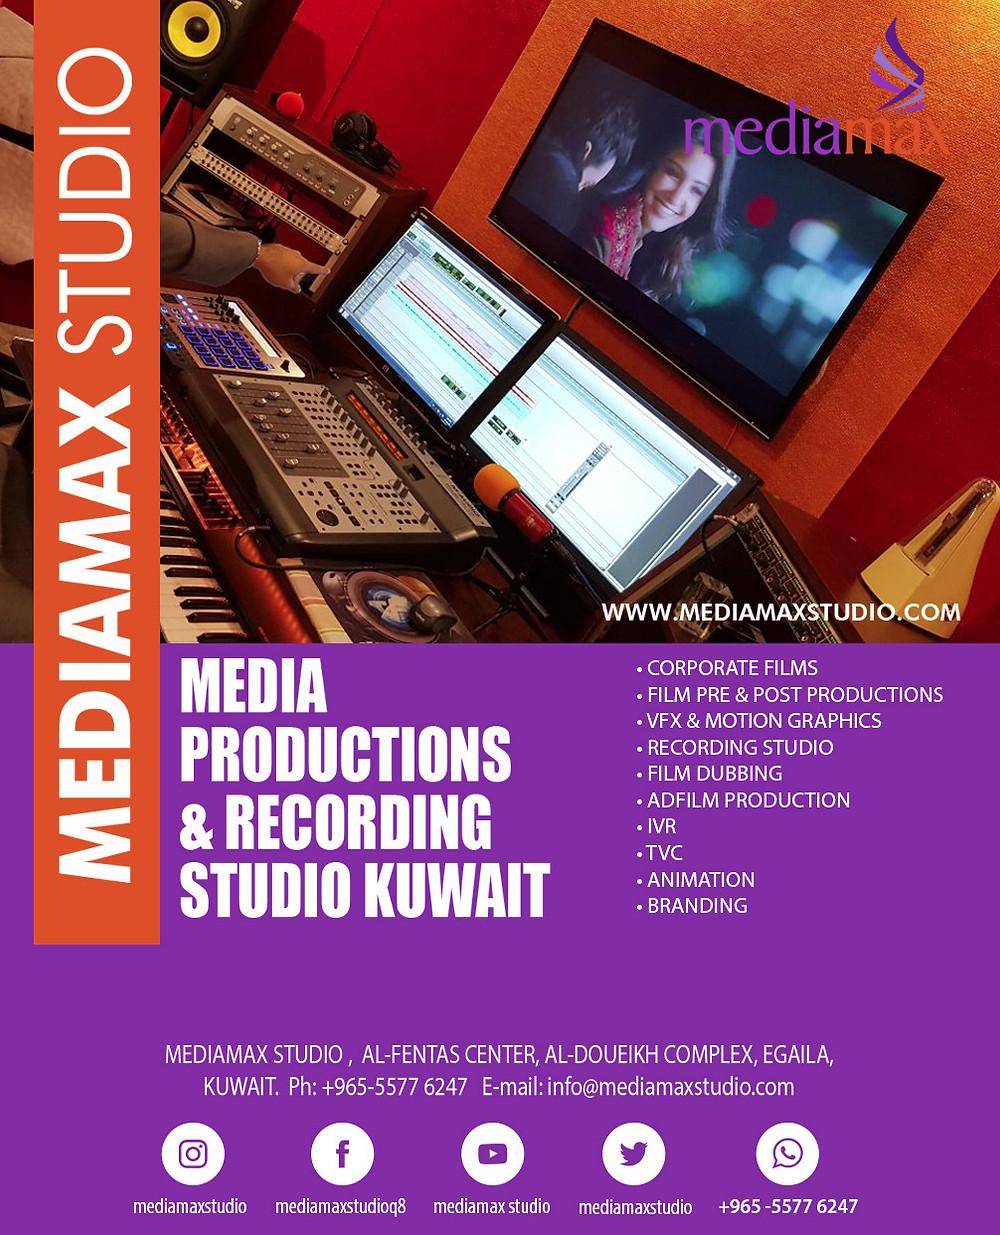 MEDIA PRODUCTIONS & RECORDING STUDIO